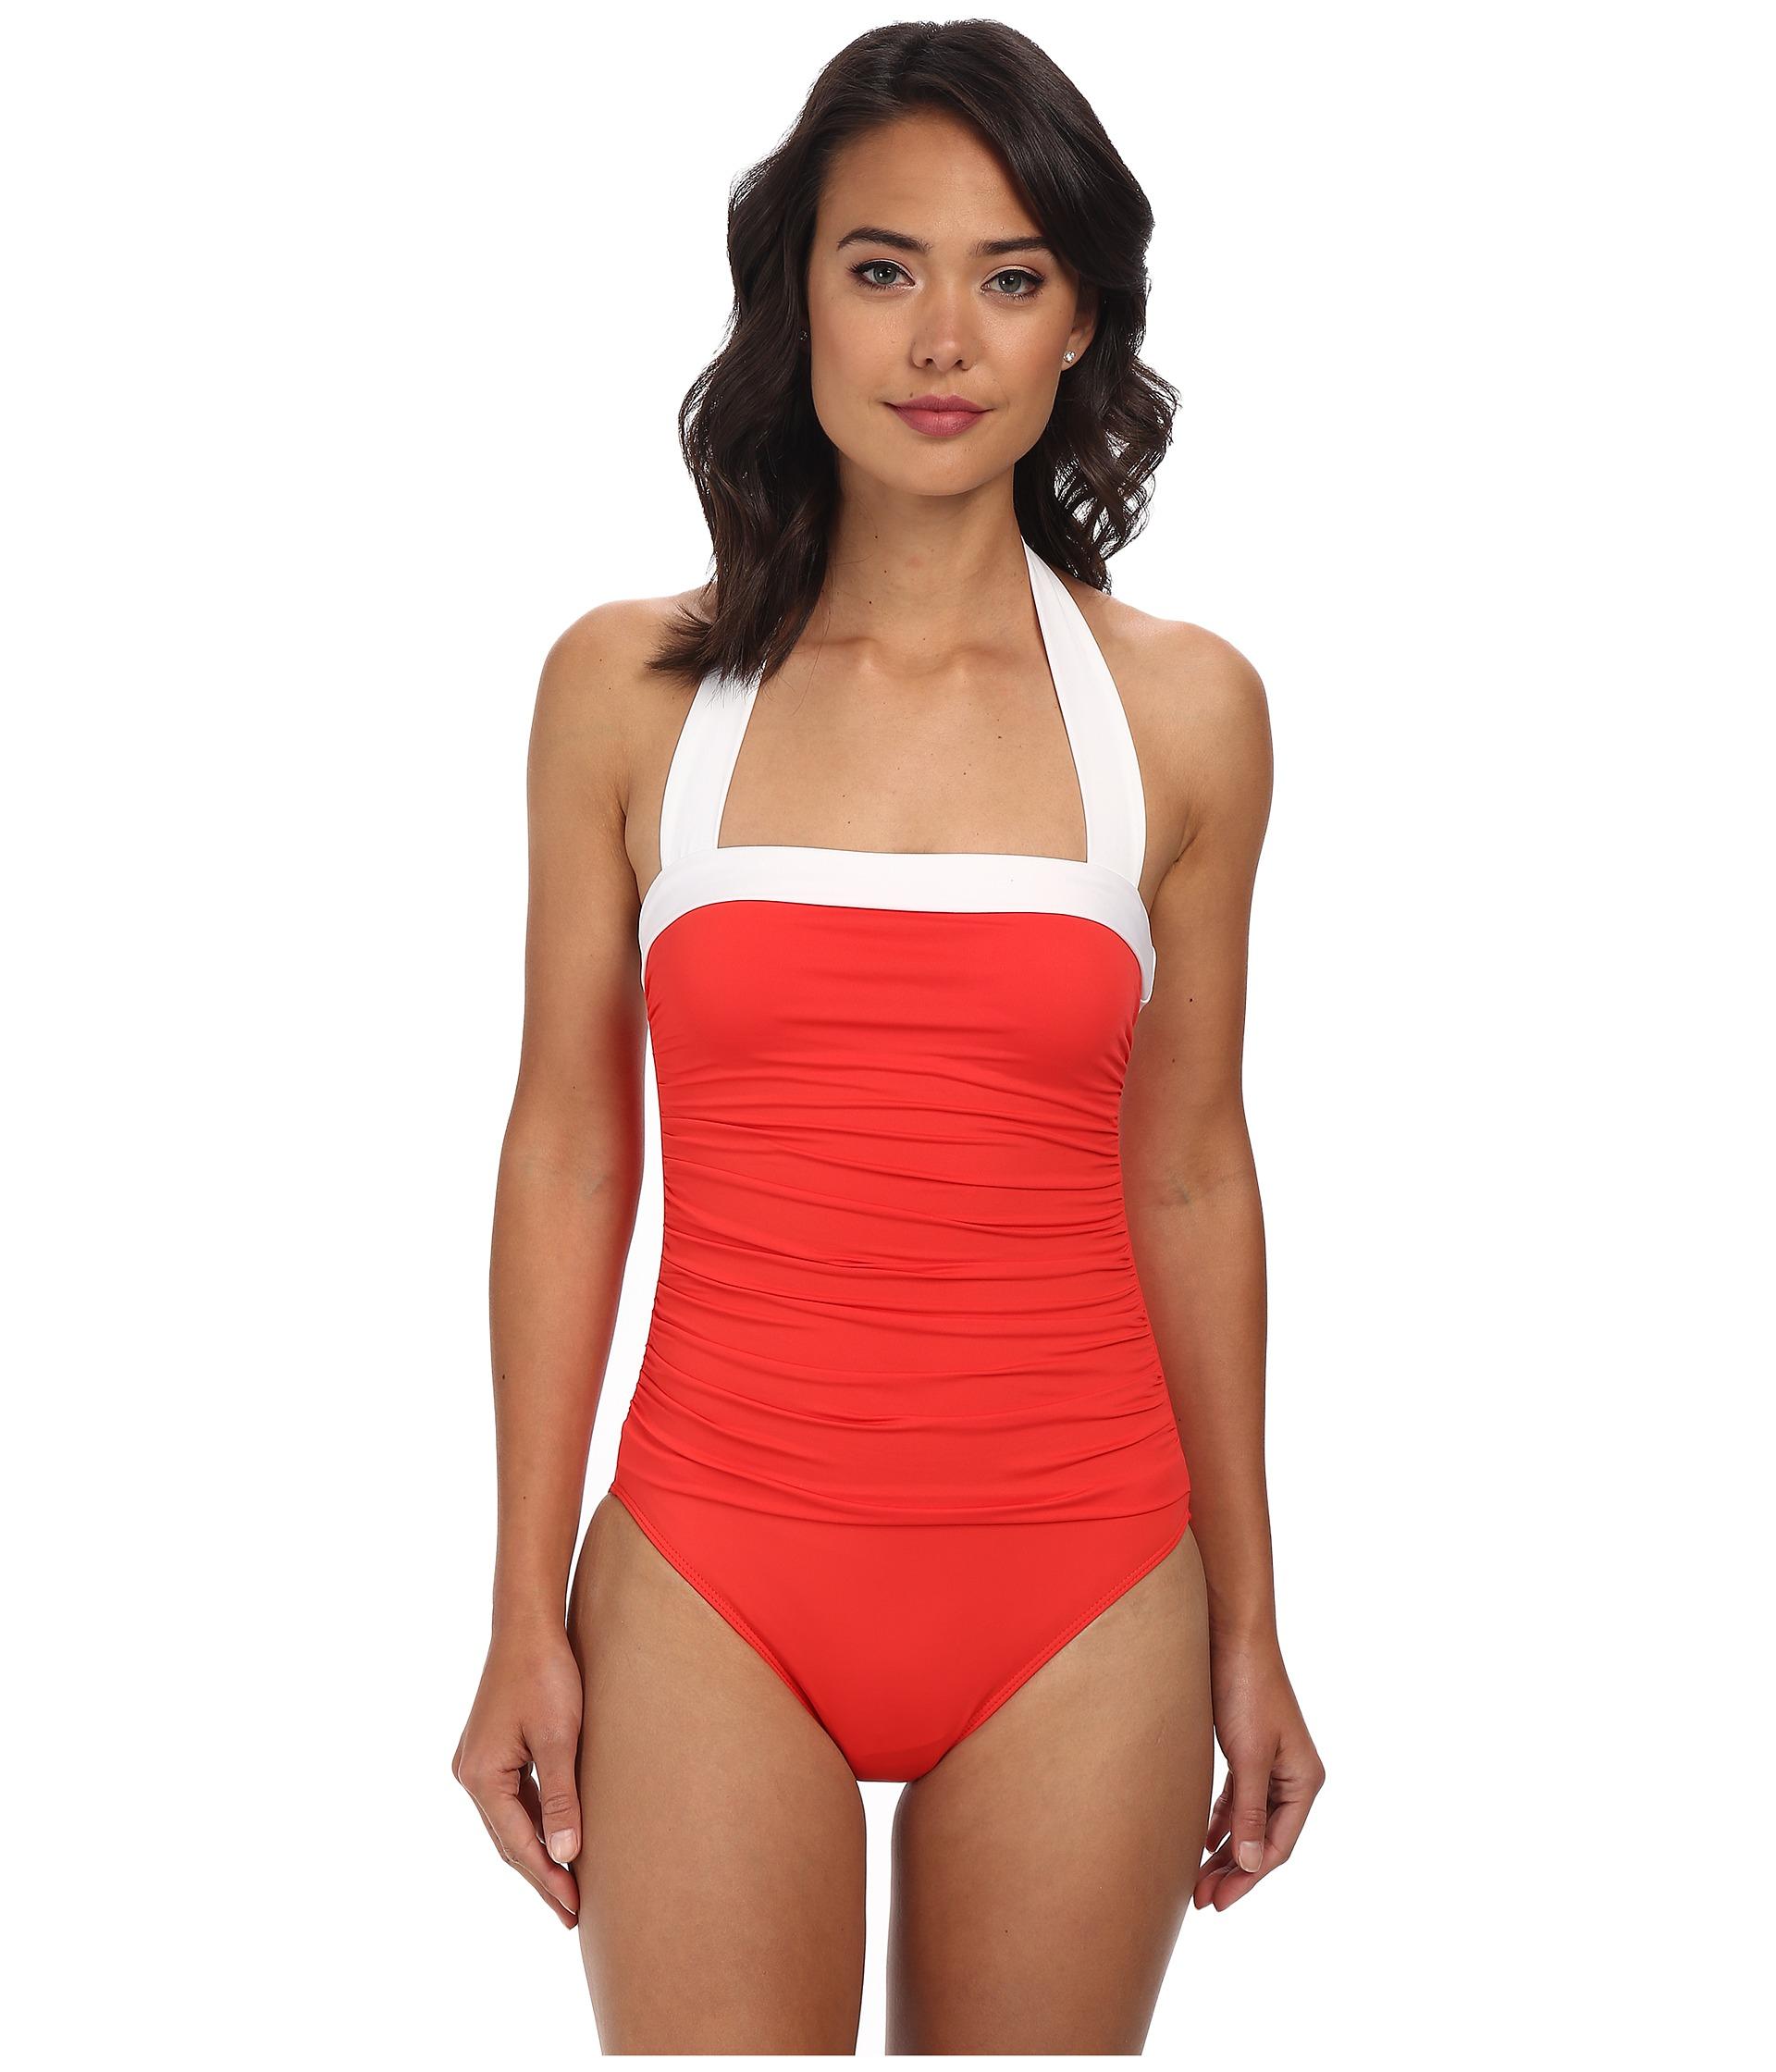 205d0a0281c Lauren by Ralph Lauren Bel Aire Solids Shirred Bandeau Mio Slimming ...